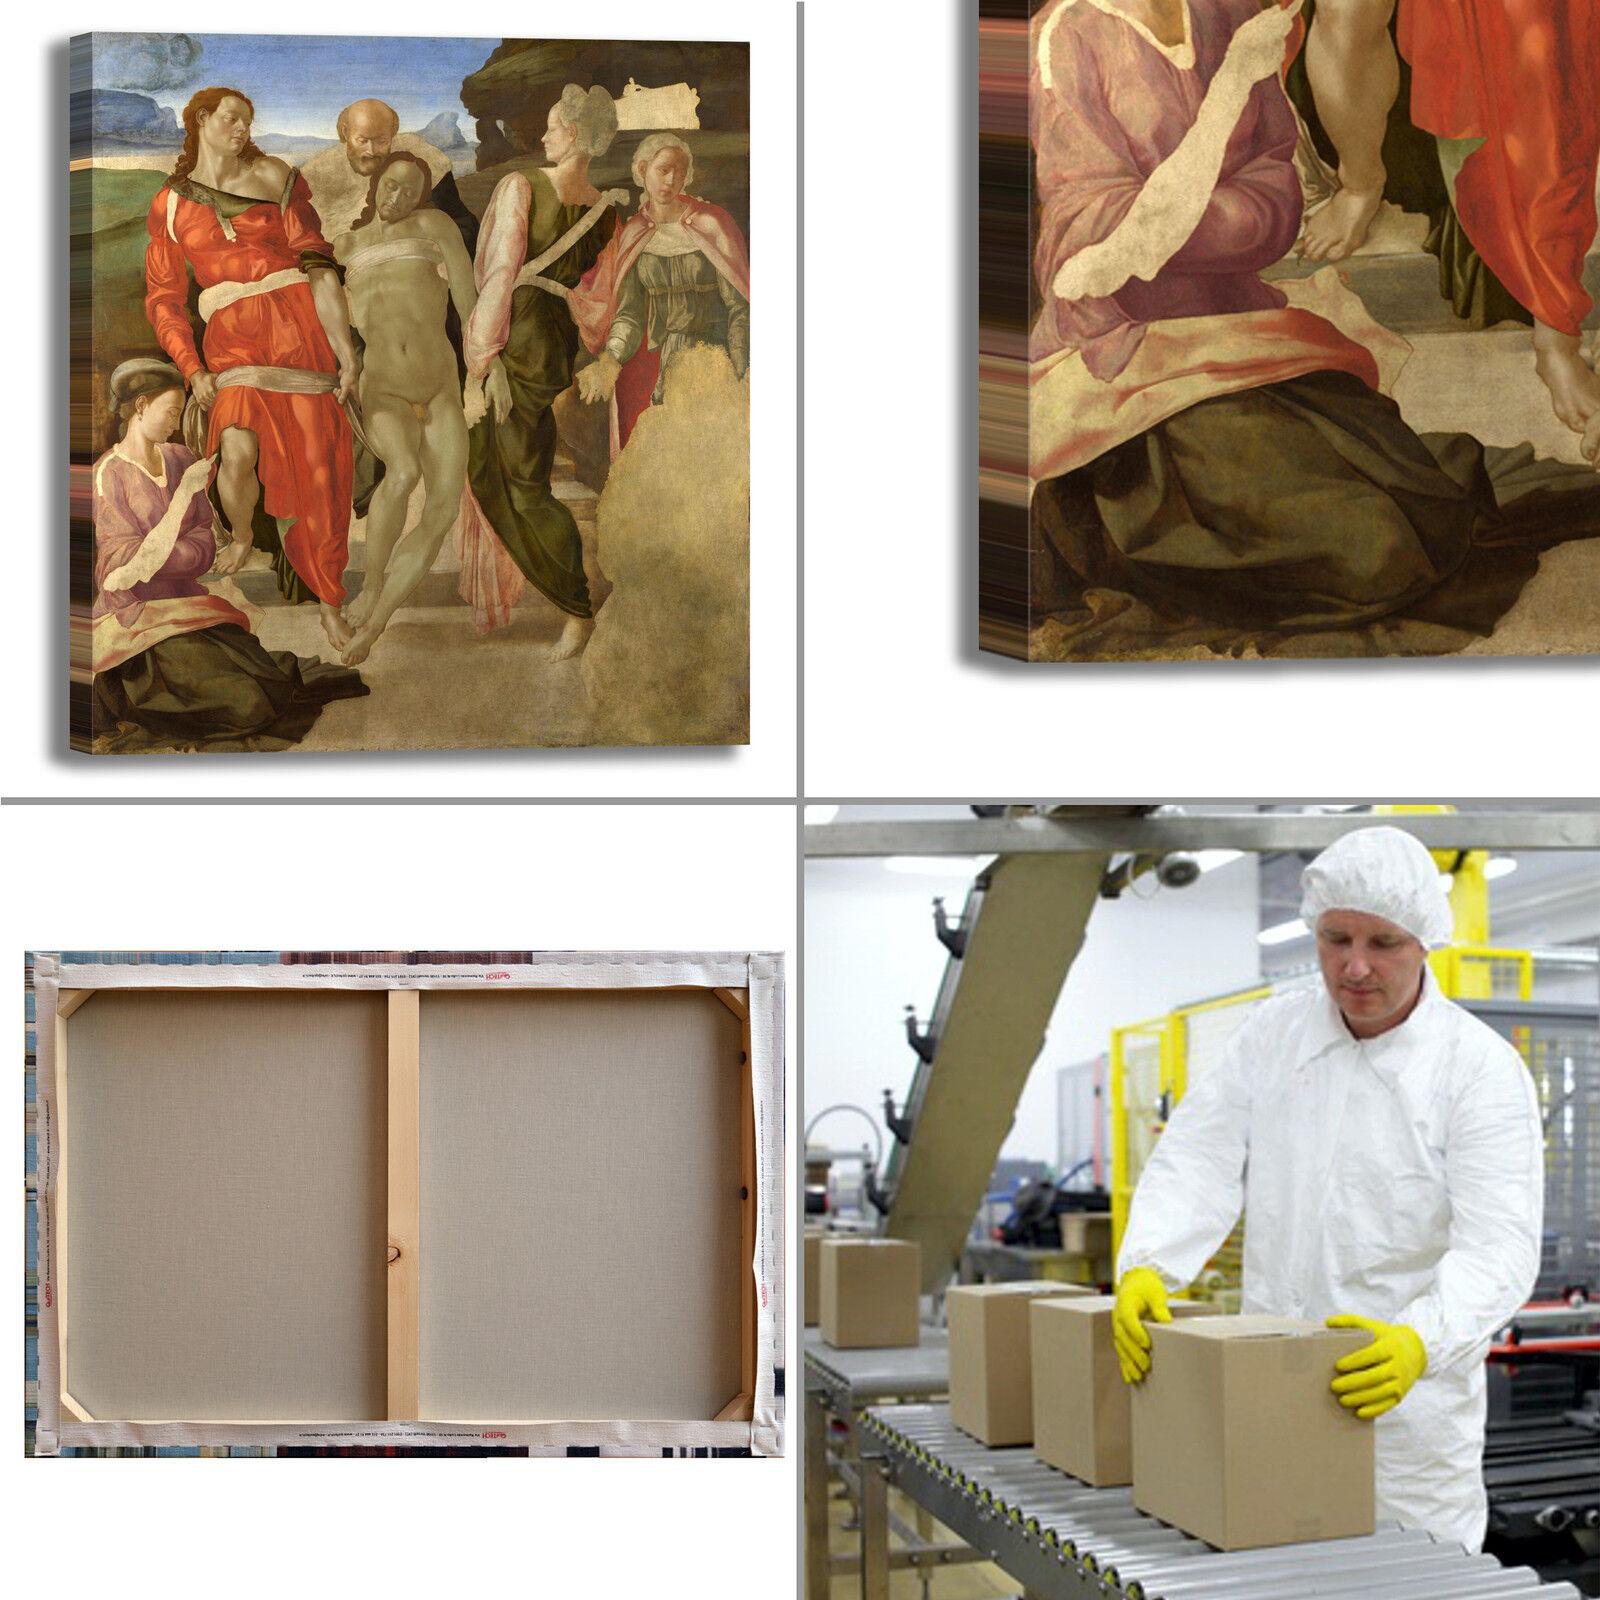 Michelangelo sepoltura design quadro stampa tela dipinto telaio telaio telaio arroto casa 2b0d97